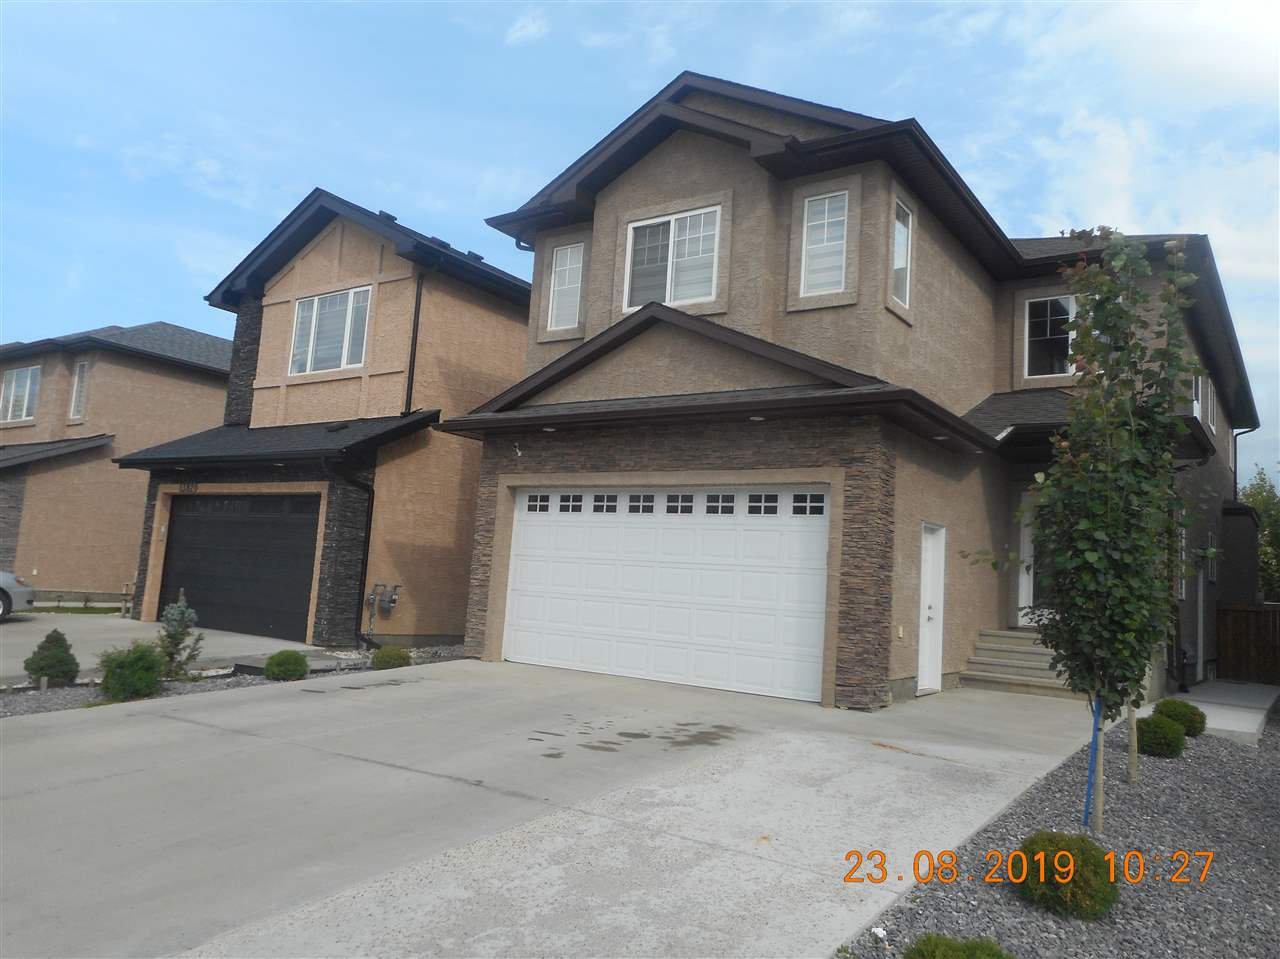 Main Photo: 13816 163 Avenue in Edmonton: Zone 27 House for sale : MLS®# E4199862